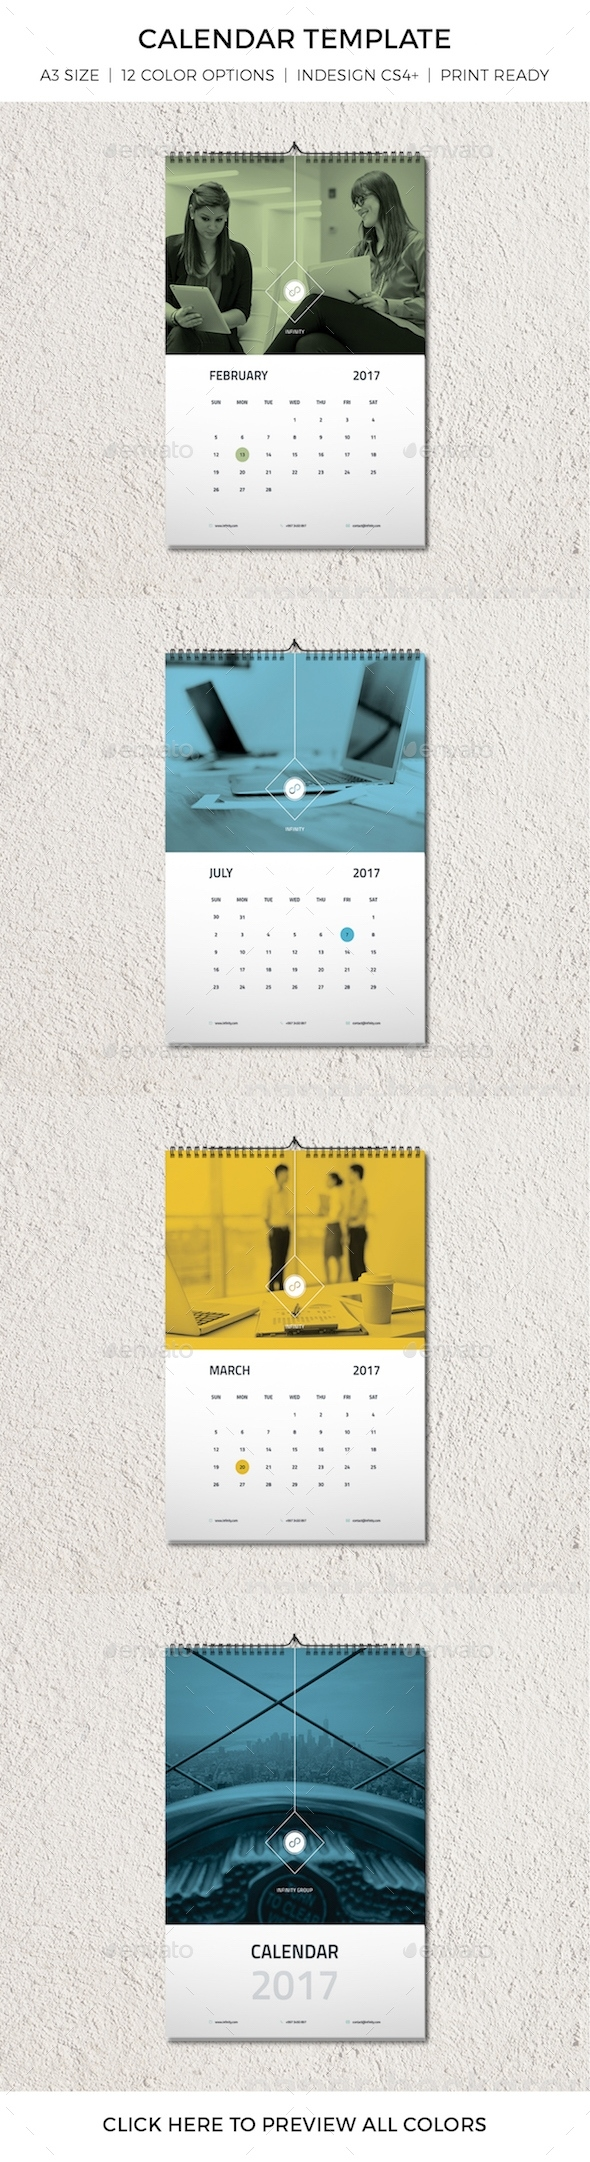 Calendar Template Graphics, Designs & Templates Calendar Template Graphic Design